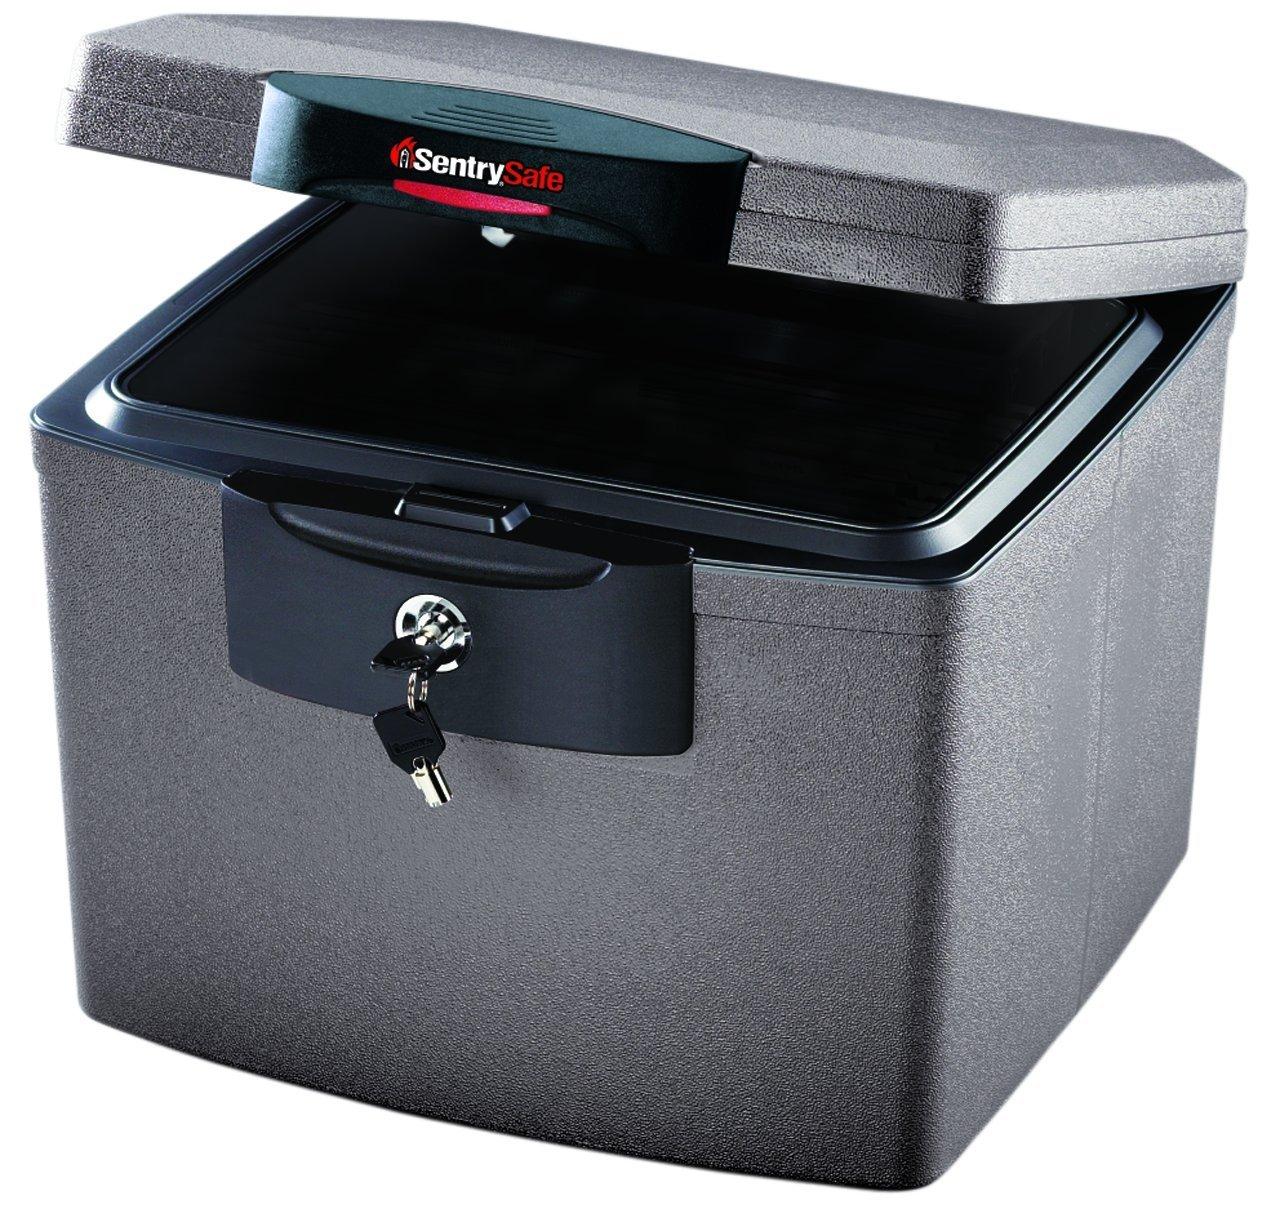 SentrySafe H4300 FIRE-SAFE Waterproof File, 0.68 Cubic Feet, Silver Gray